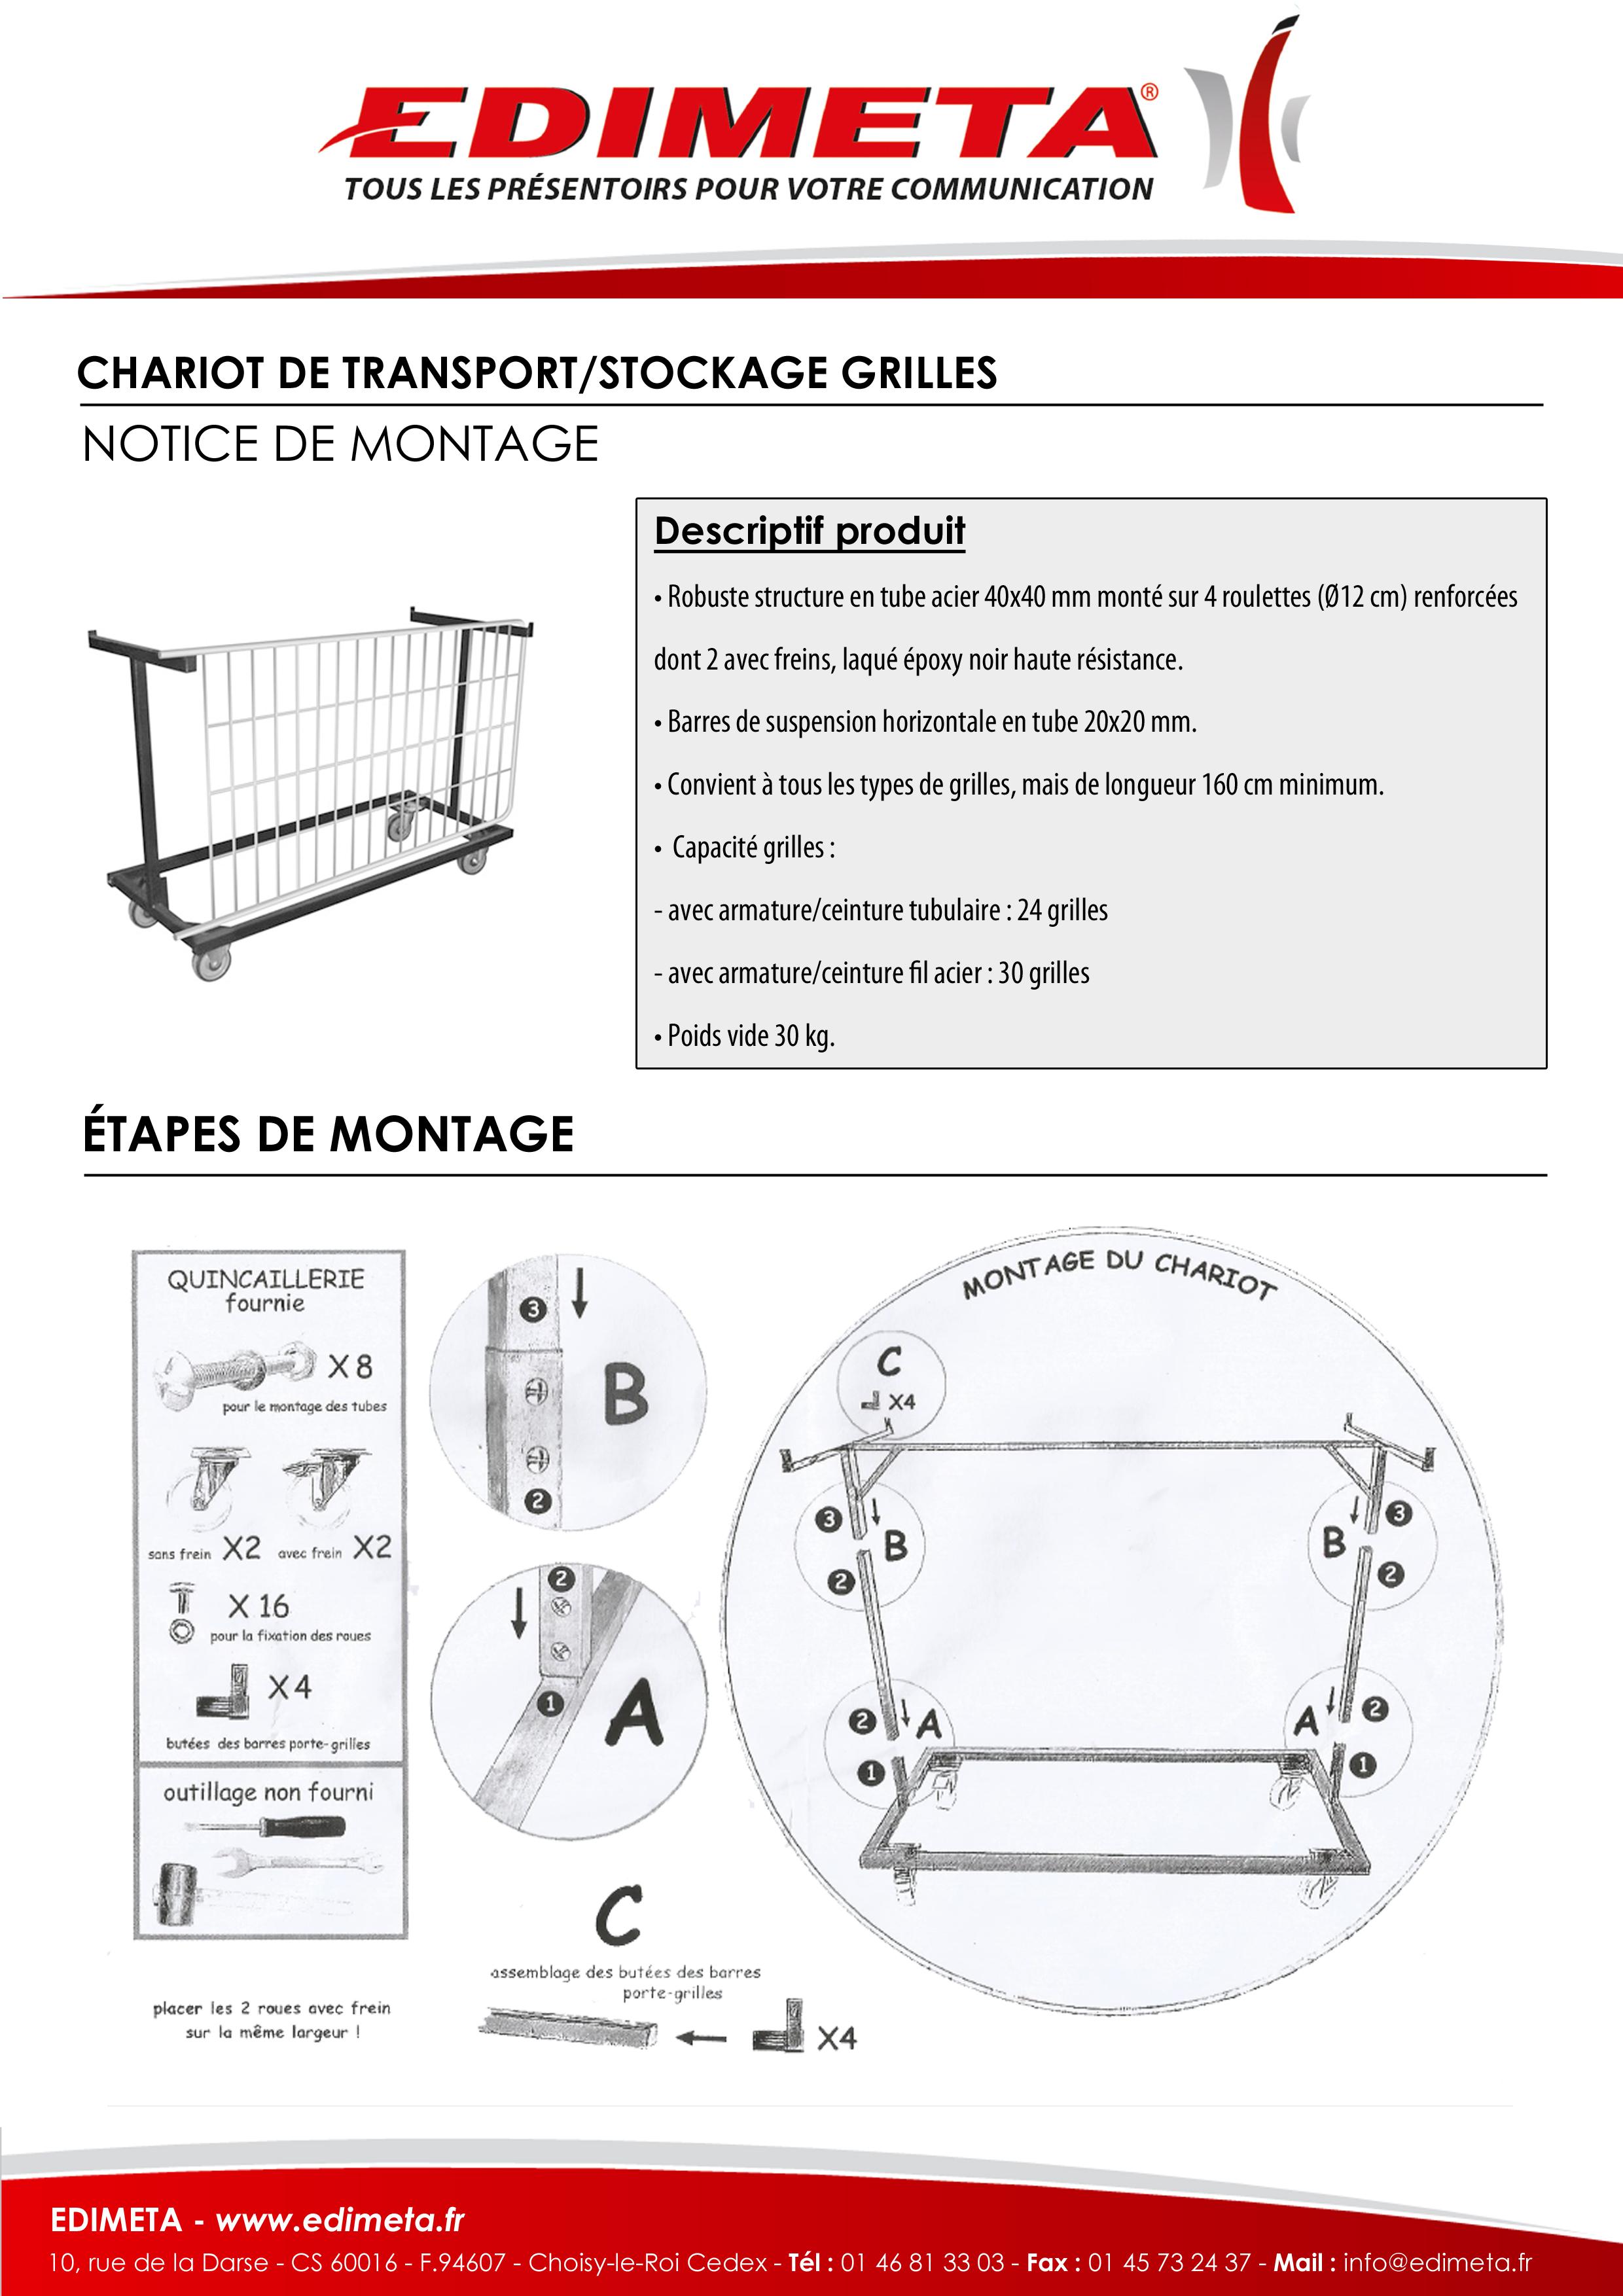 NOTICE DE MONTAGE : CHARIOT DE TRANSPORT/STOCKAGE GRILLES